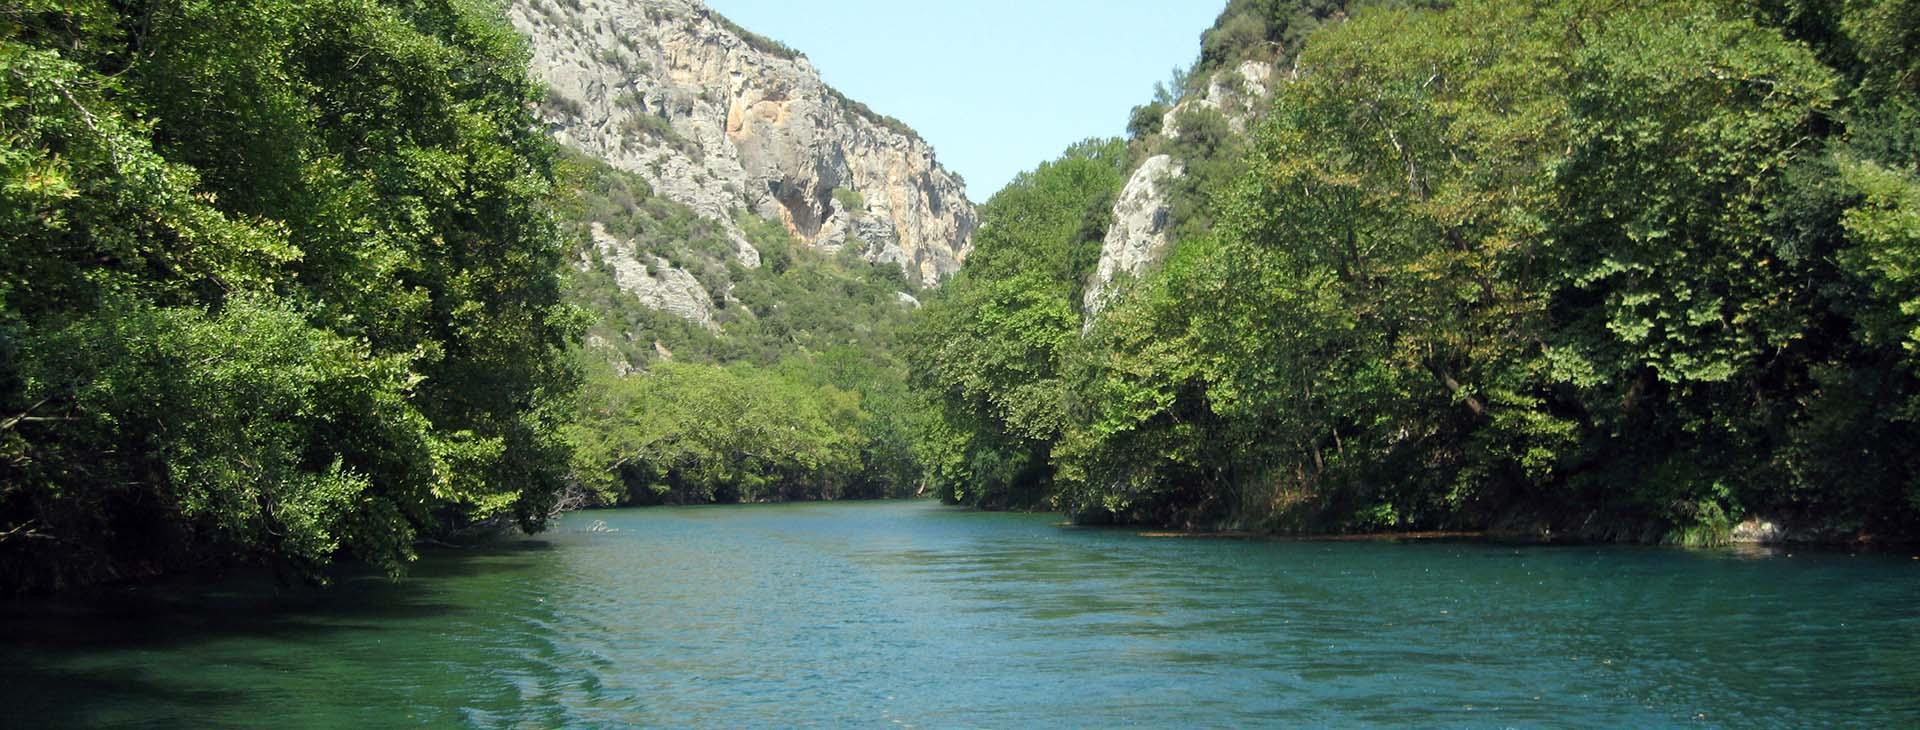 Pinios river / Tempi Valley, Larisa